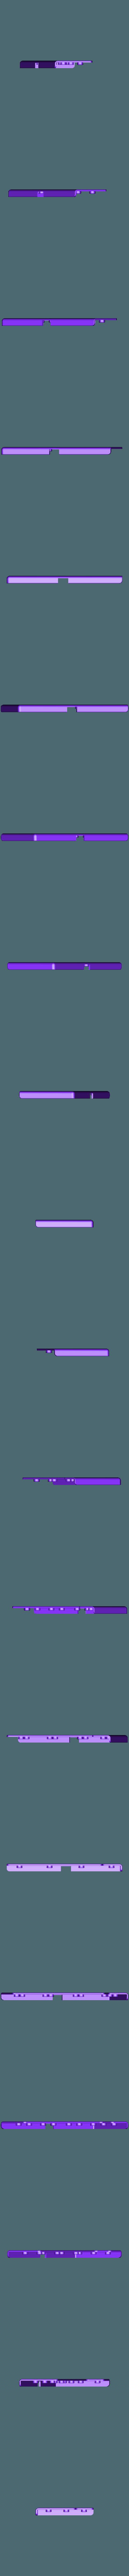 CR-10 Wire Deflector-02.STL Download free STL file CR-10 Wire Harness Wear Plate • 3D printer template, Trikonics